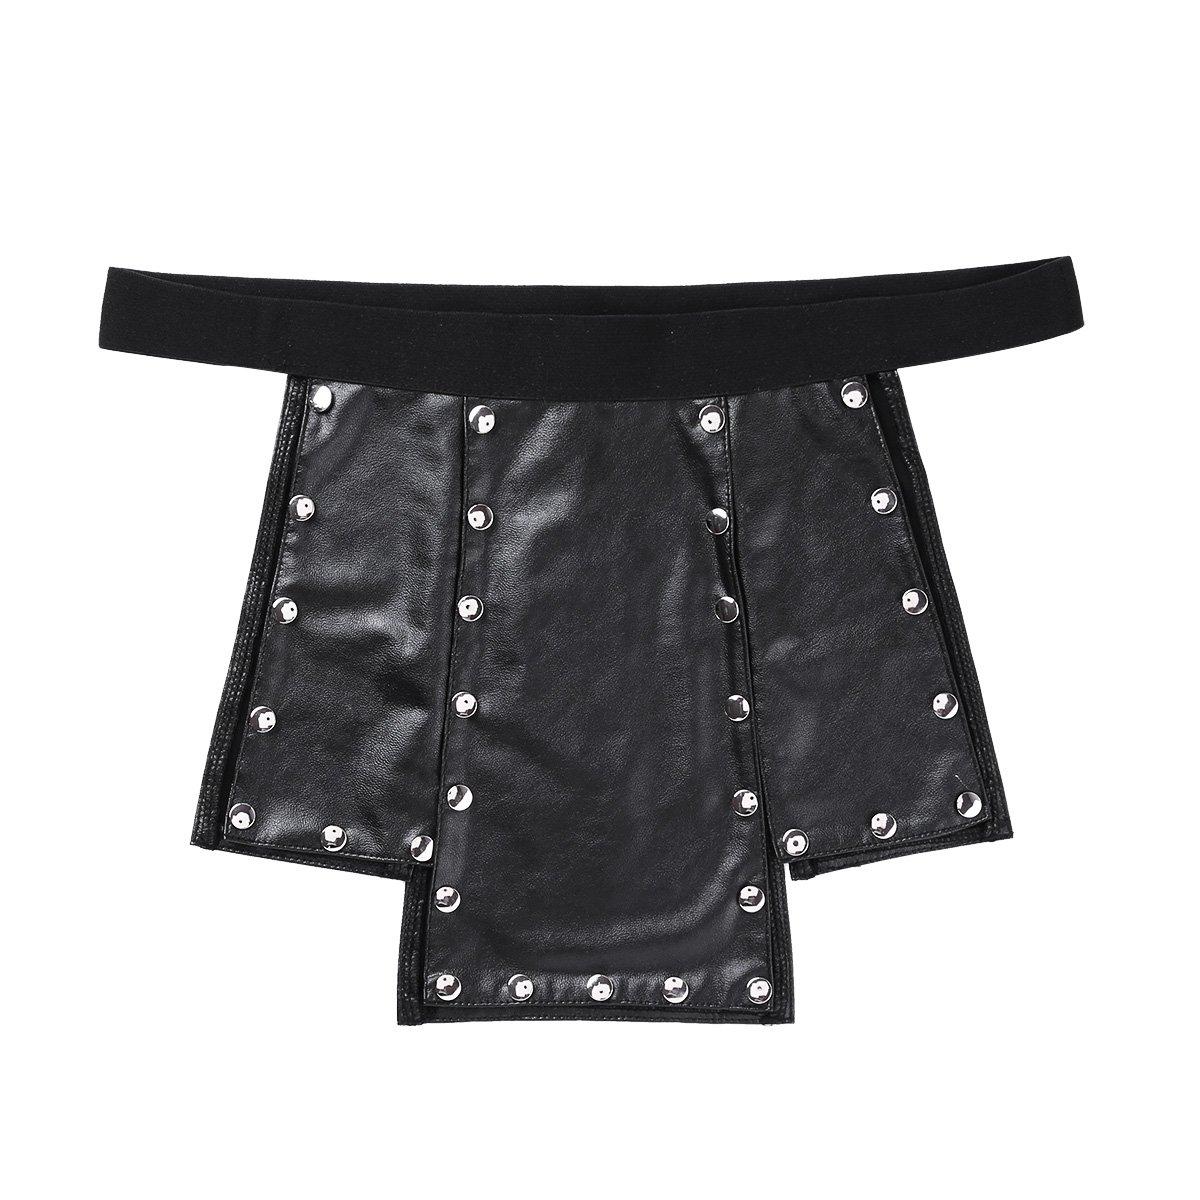 Alvivi Mens Faux Leather Low Rise Metal Studded Kilt Underwear Skirt Sexy Lingerie Clubwear Black Large